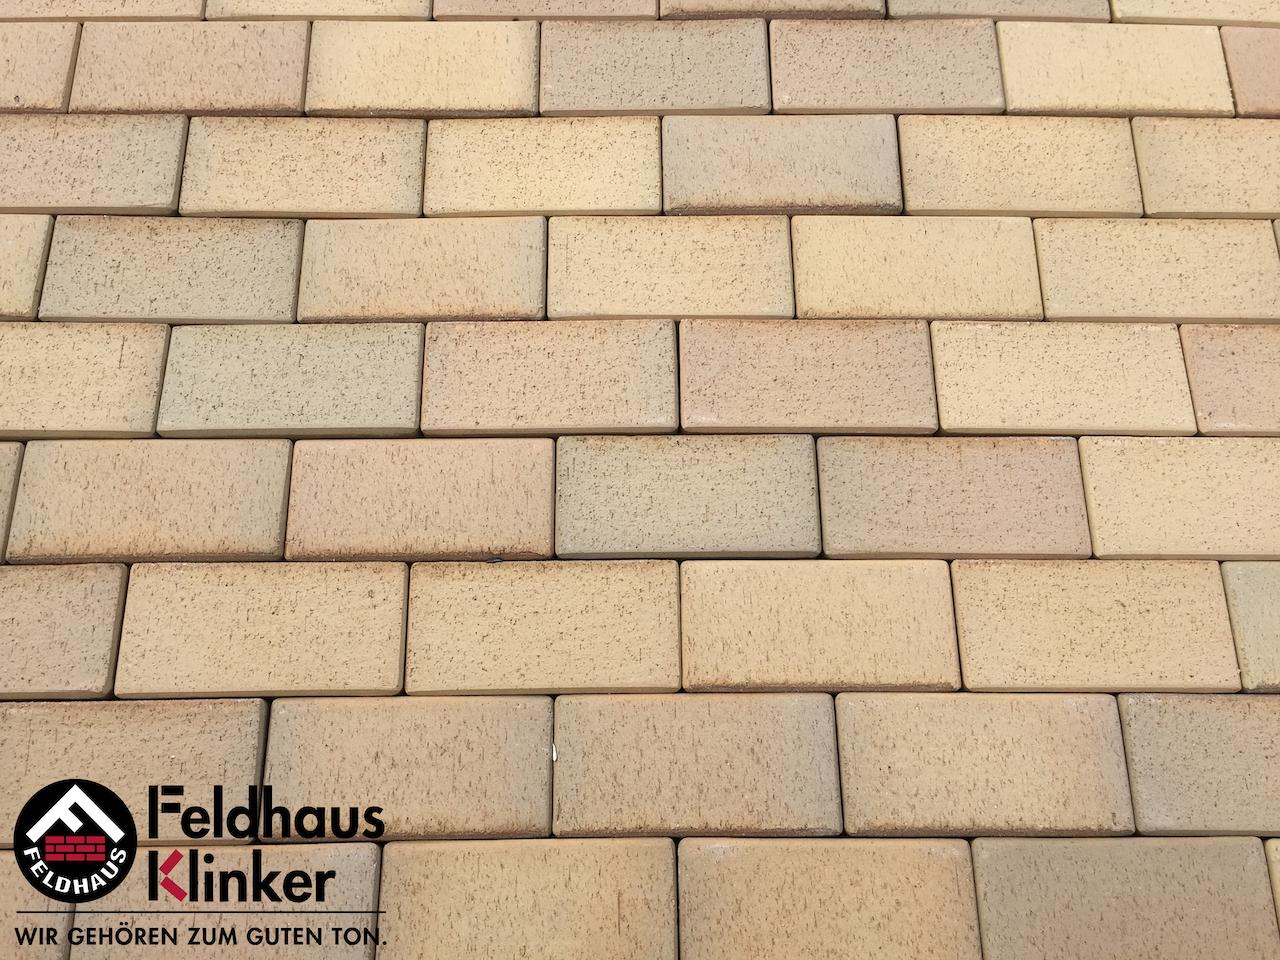 Feldhaus Klinker P273kf Cuero Flamea 10